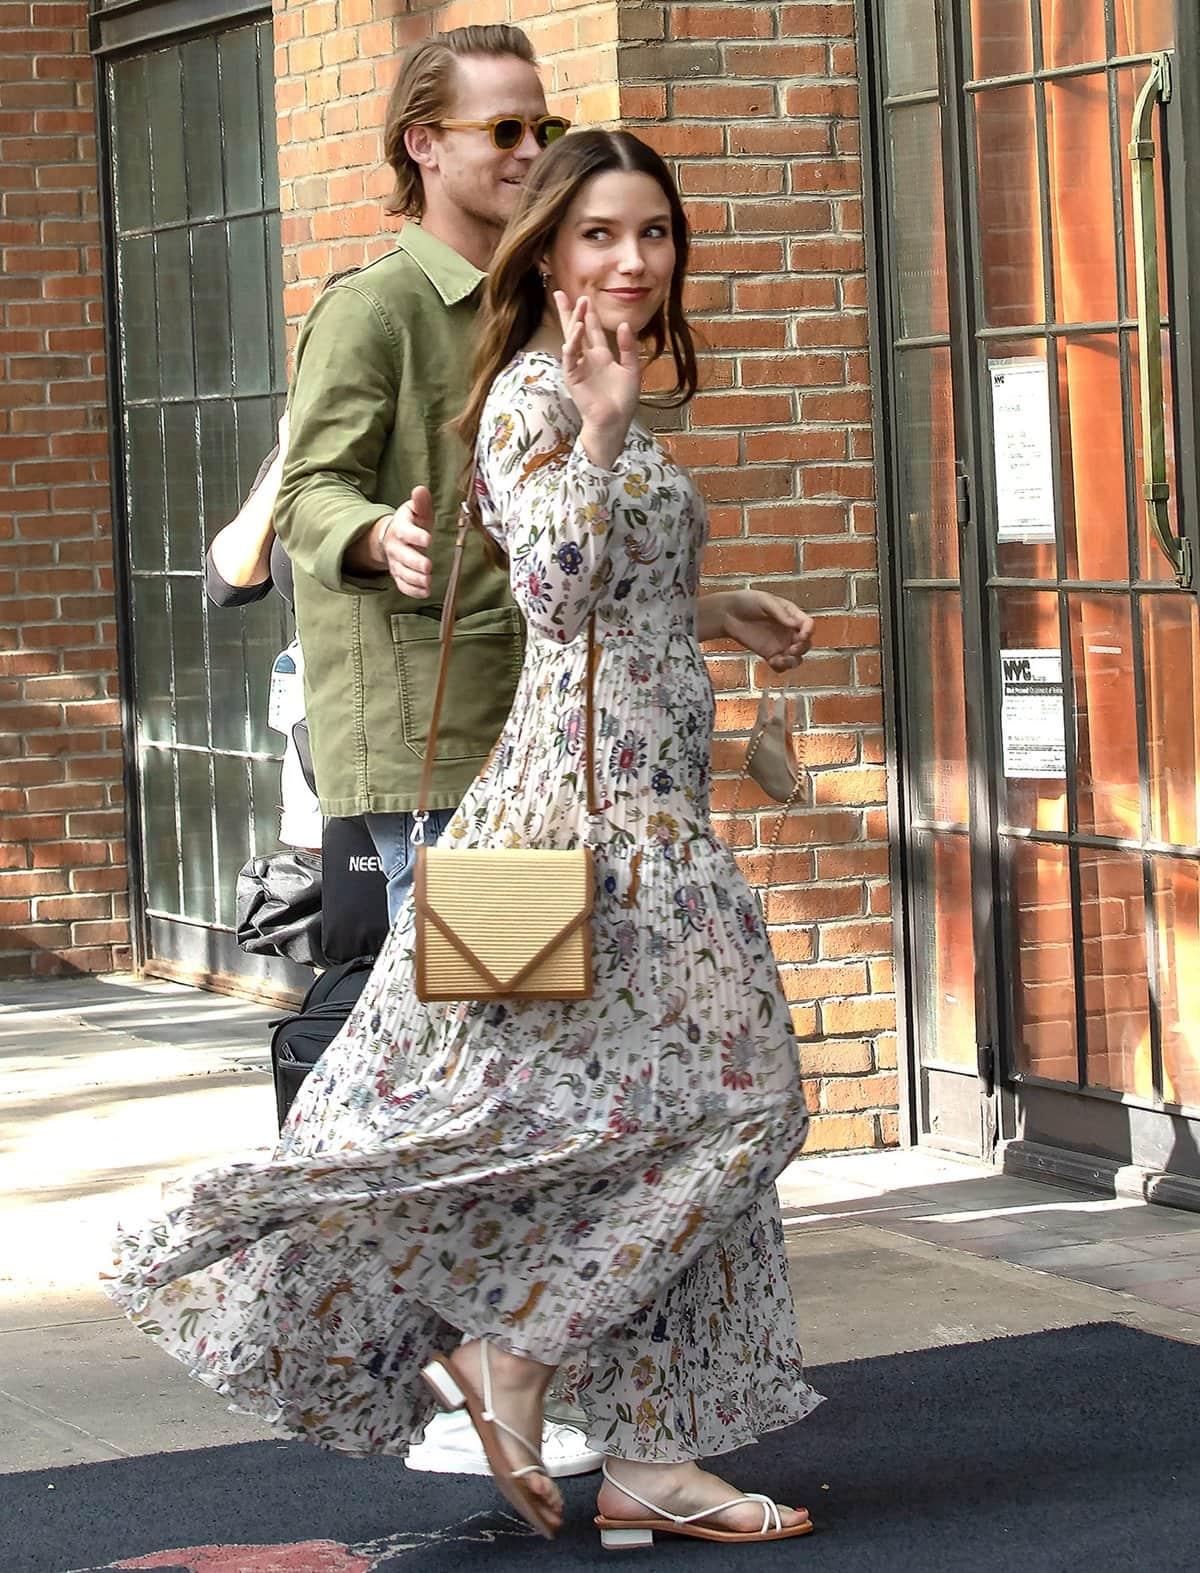 Sophia Bush got engaged to her boyfriend Grant Hughes during a romantic Italian getaway